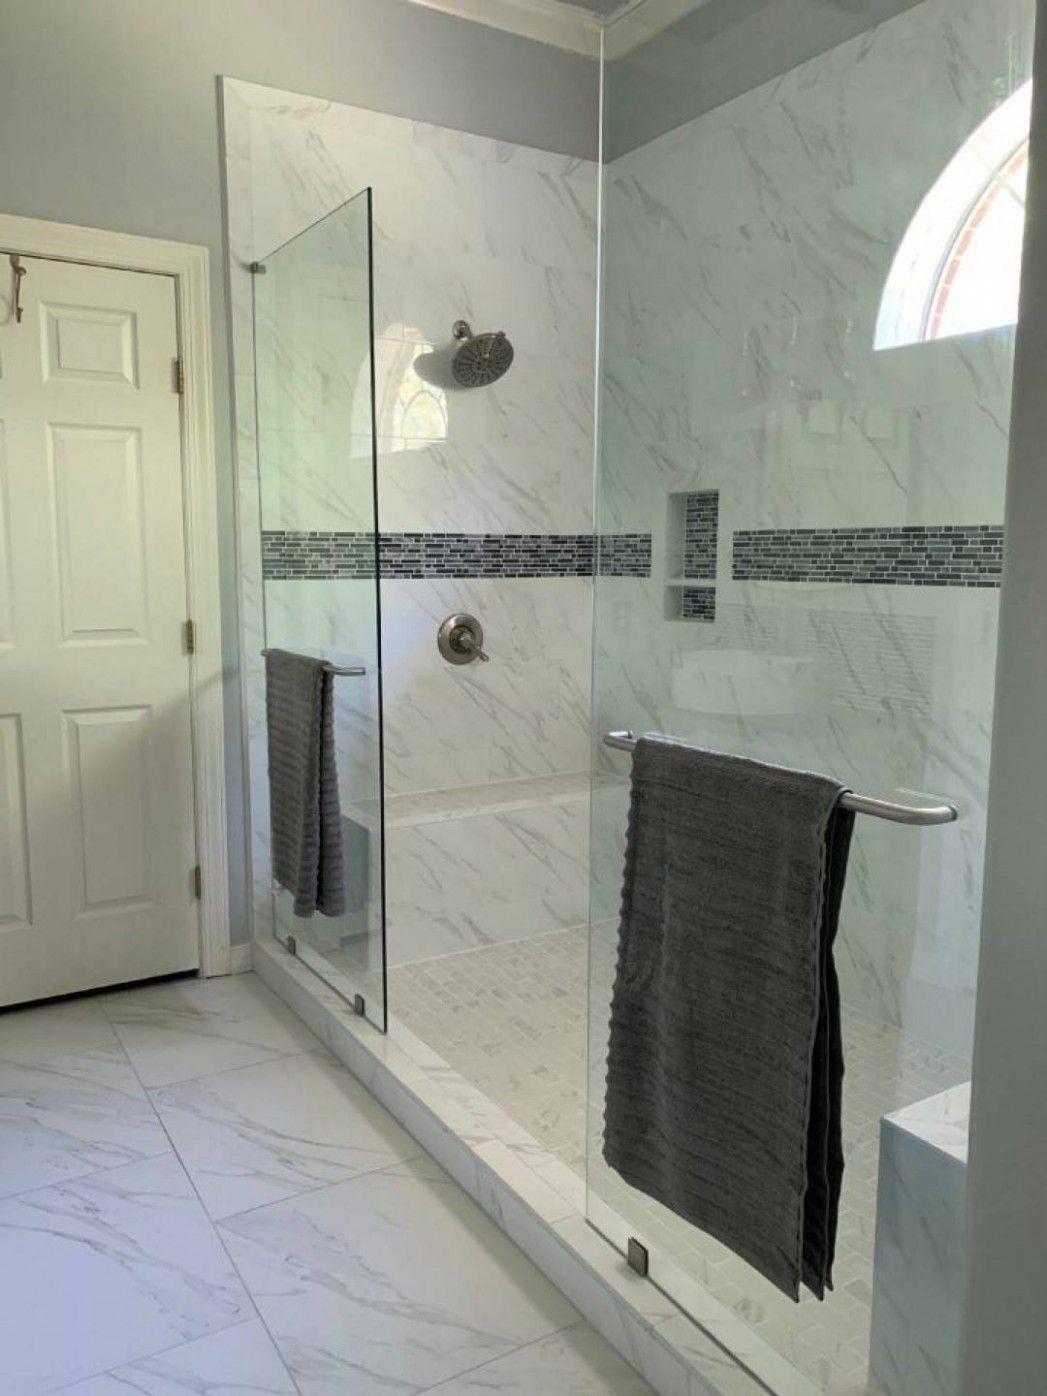 Home Depot Bathroom Remodel Ideas Home depot bathroom design ideas